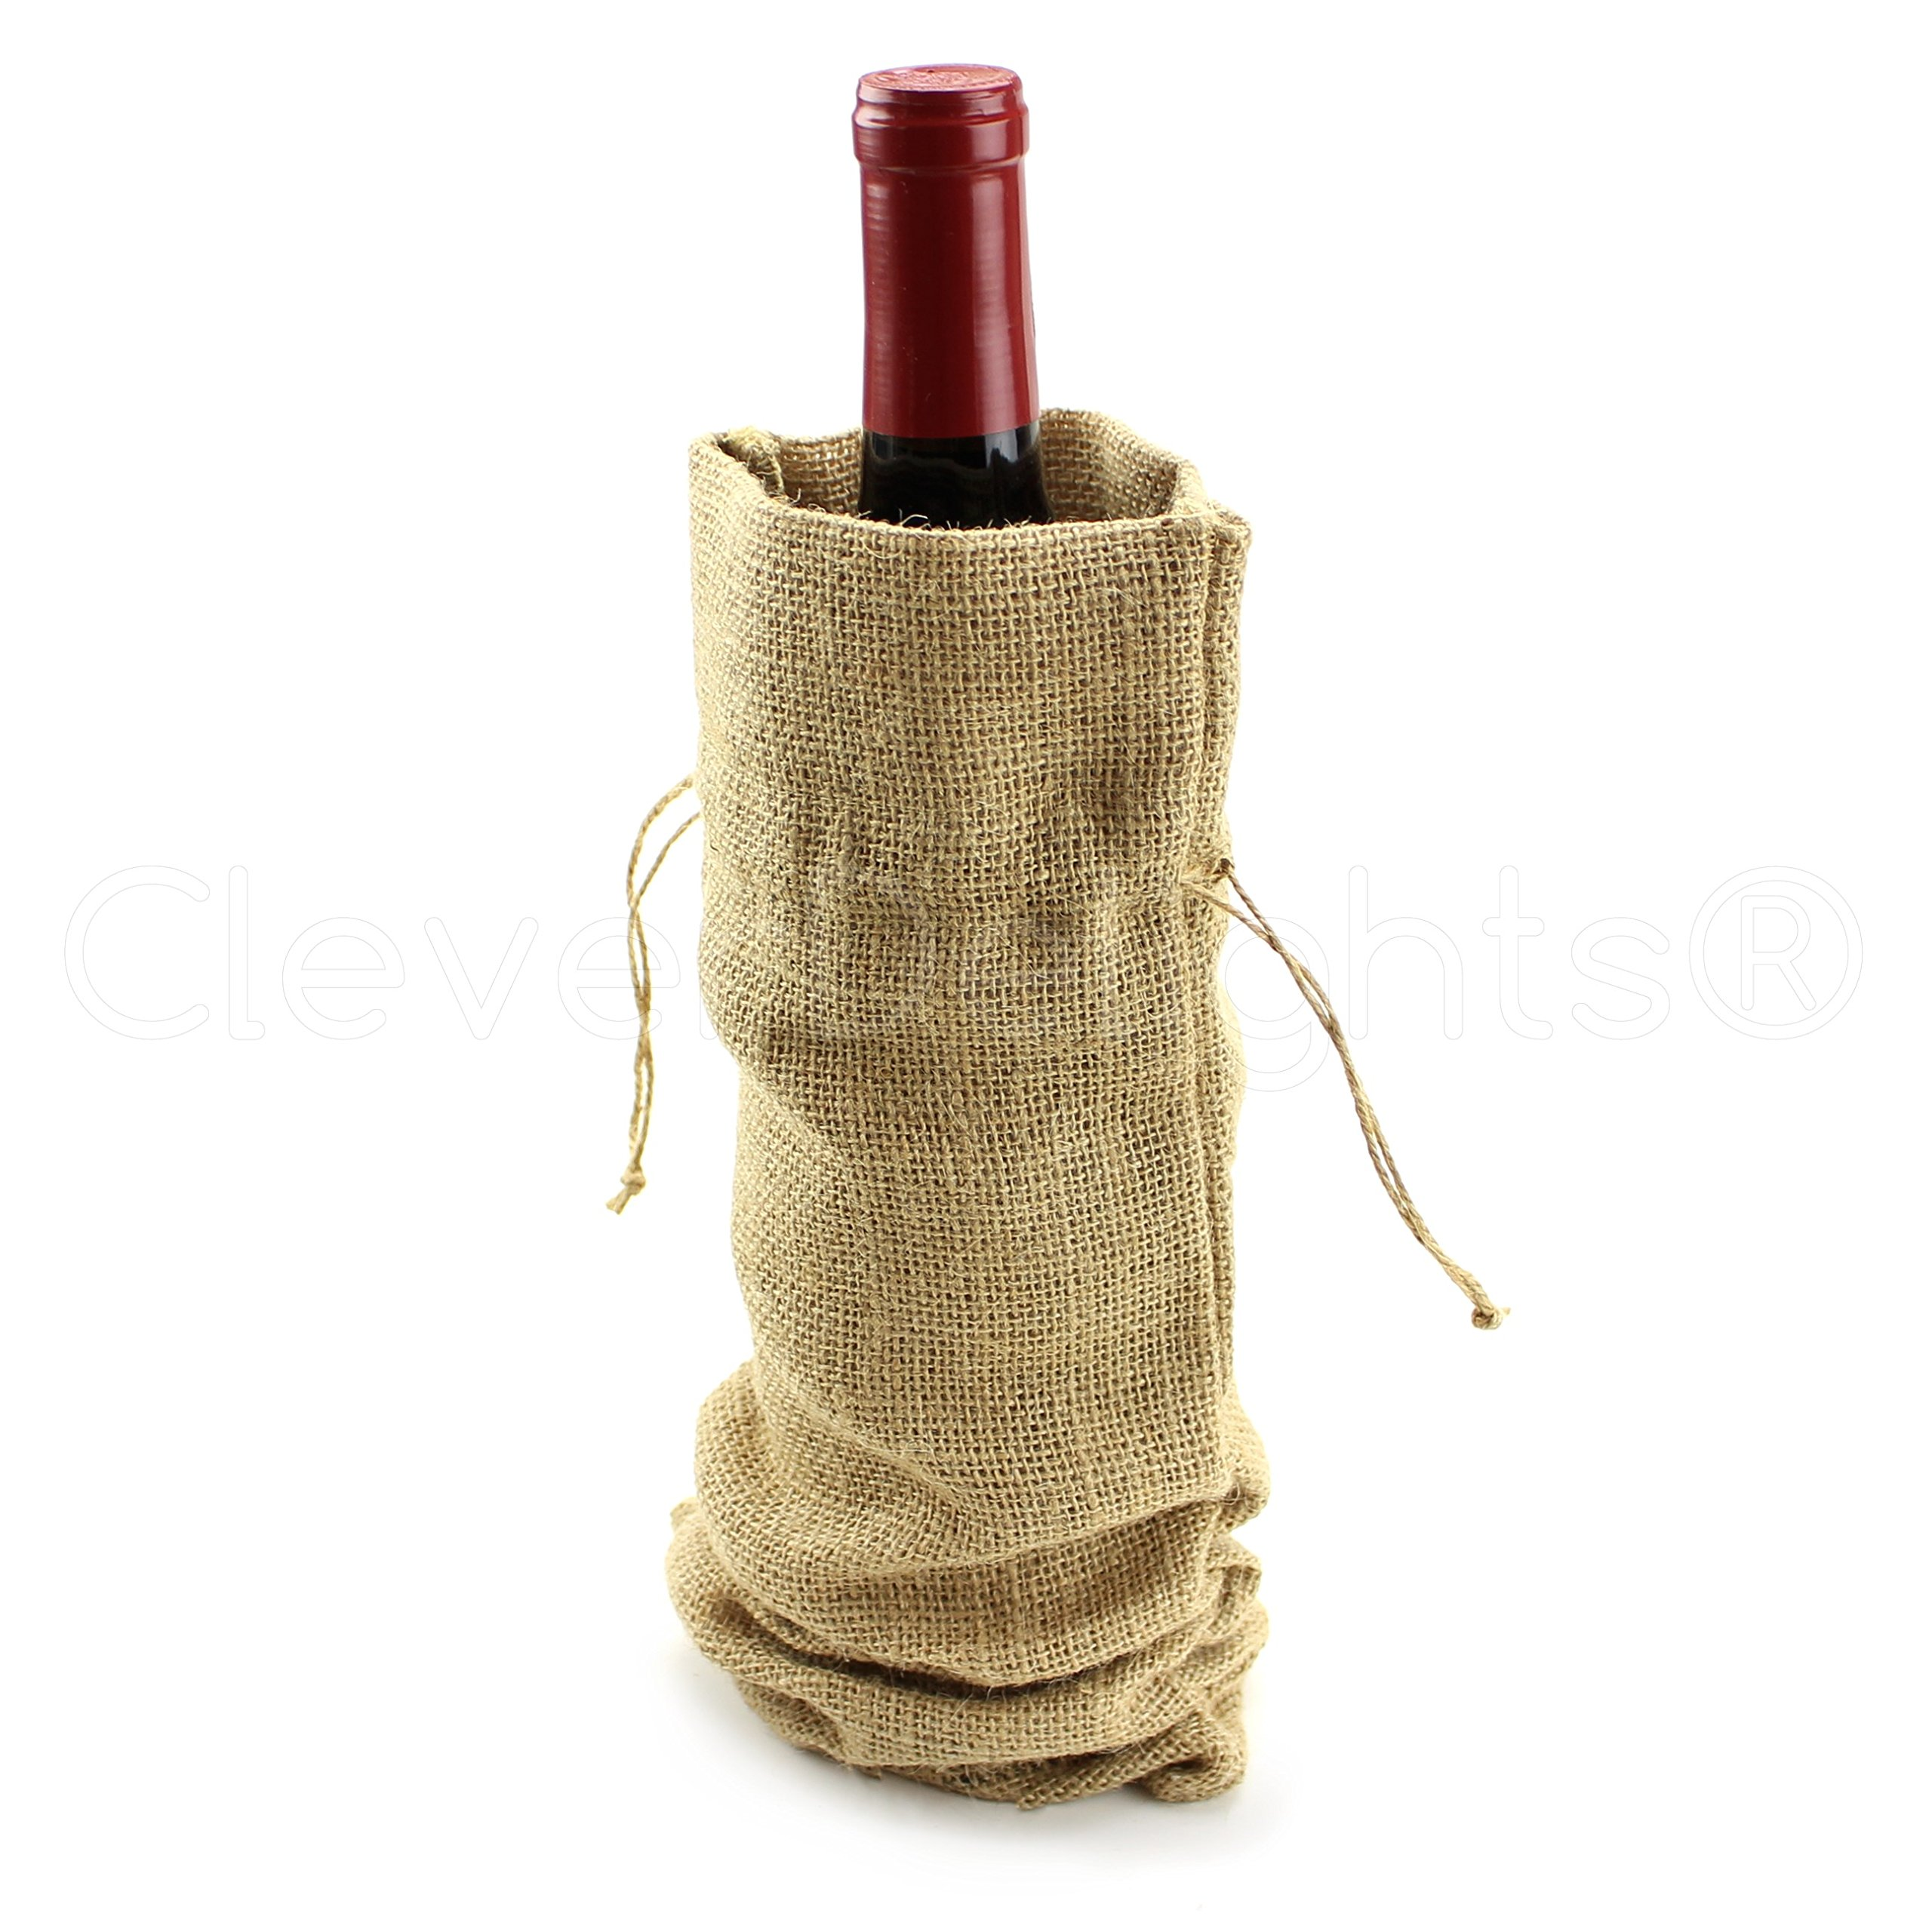 5 Pack - CleverDelights 14'' Burlap Wine Bags with Drawstrings - 100% Natural Jute Burlap - 14'' x 5''